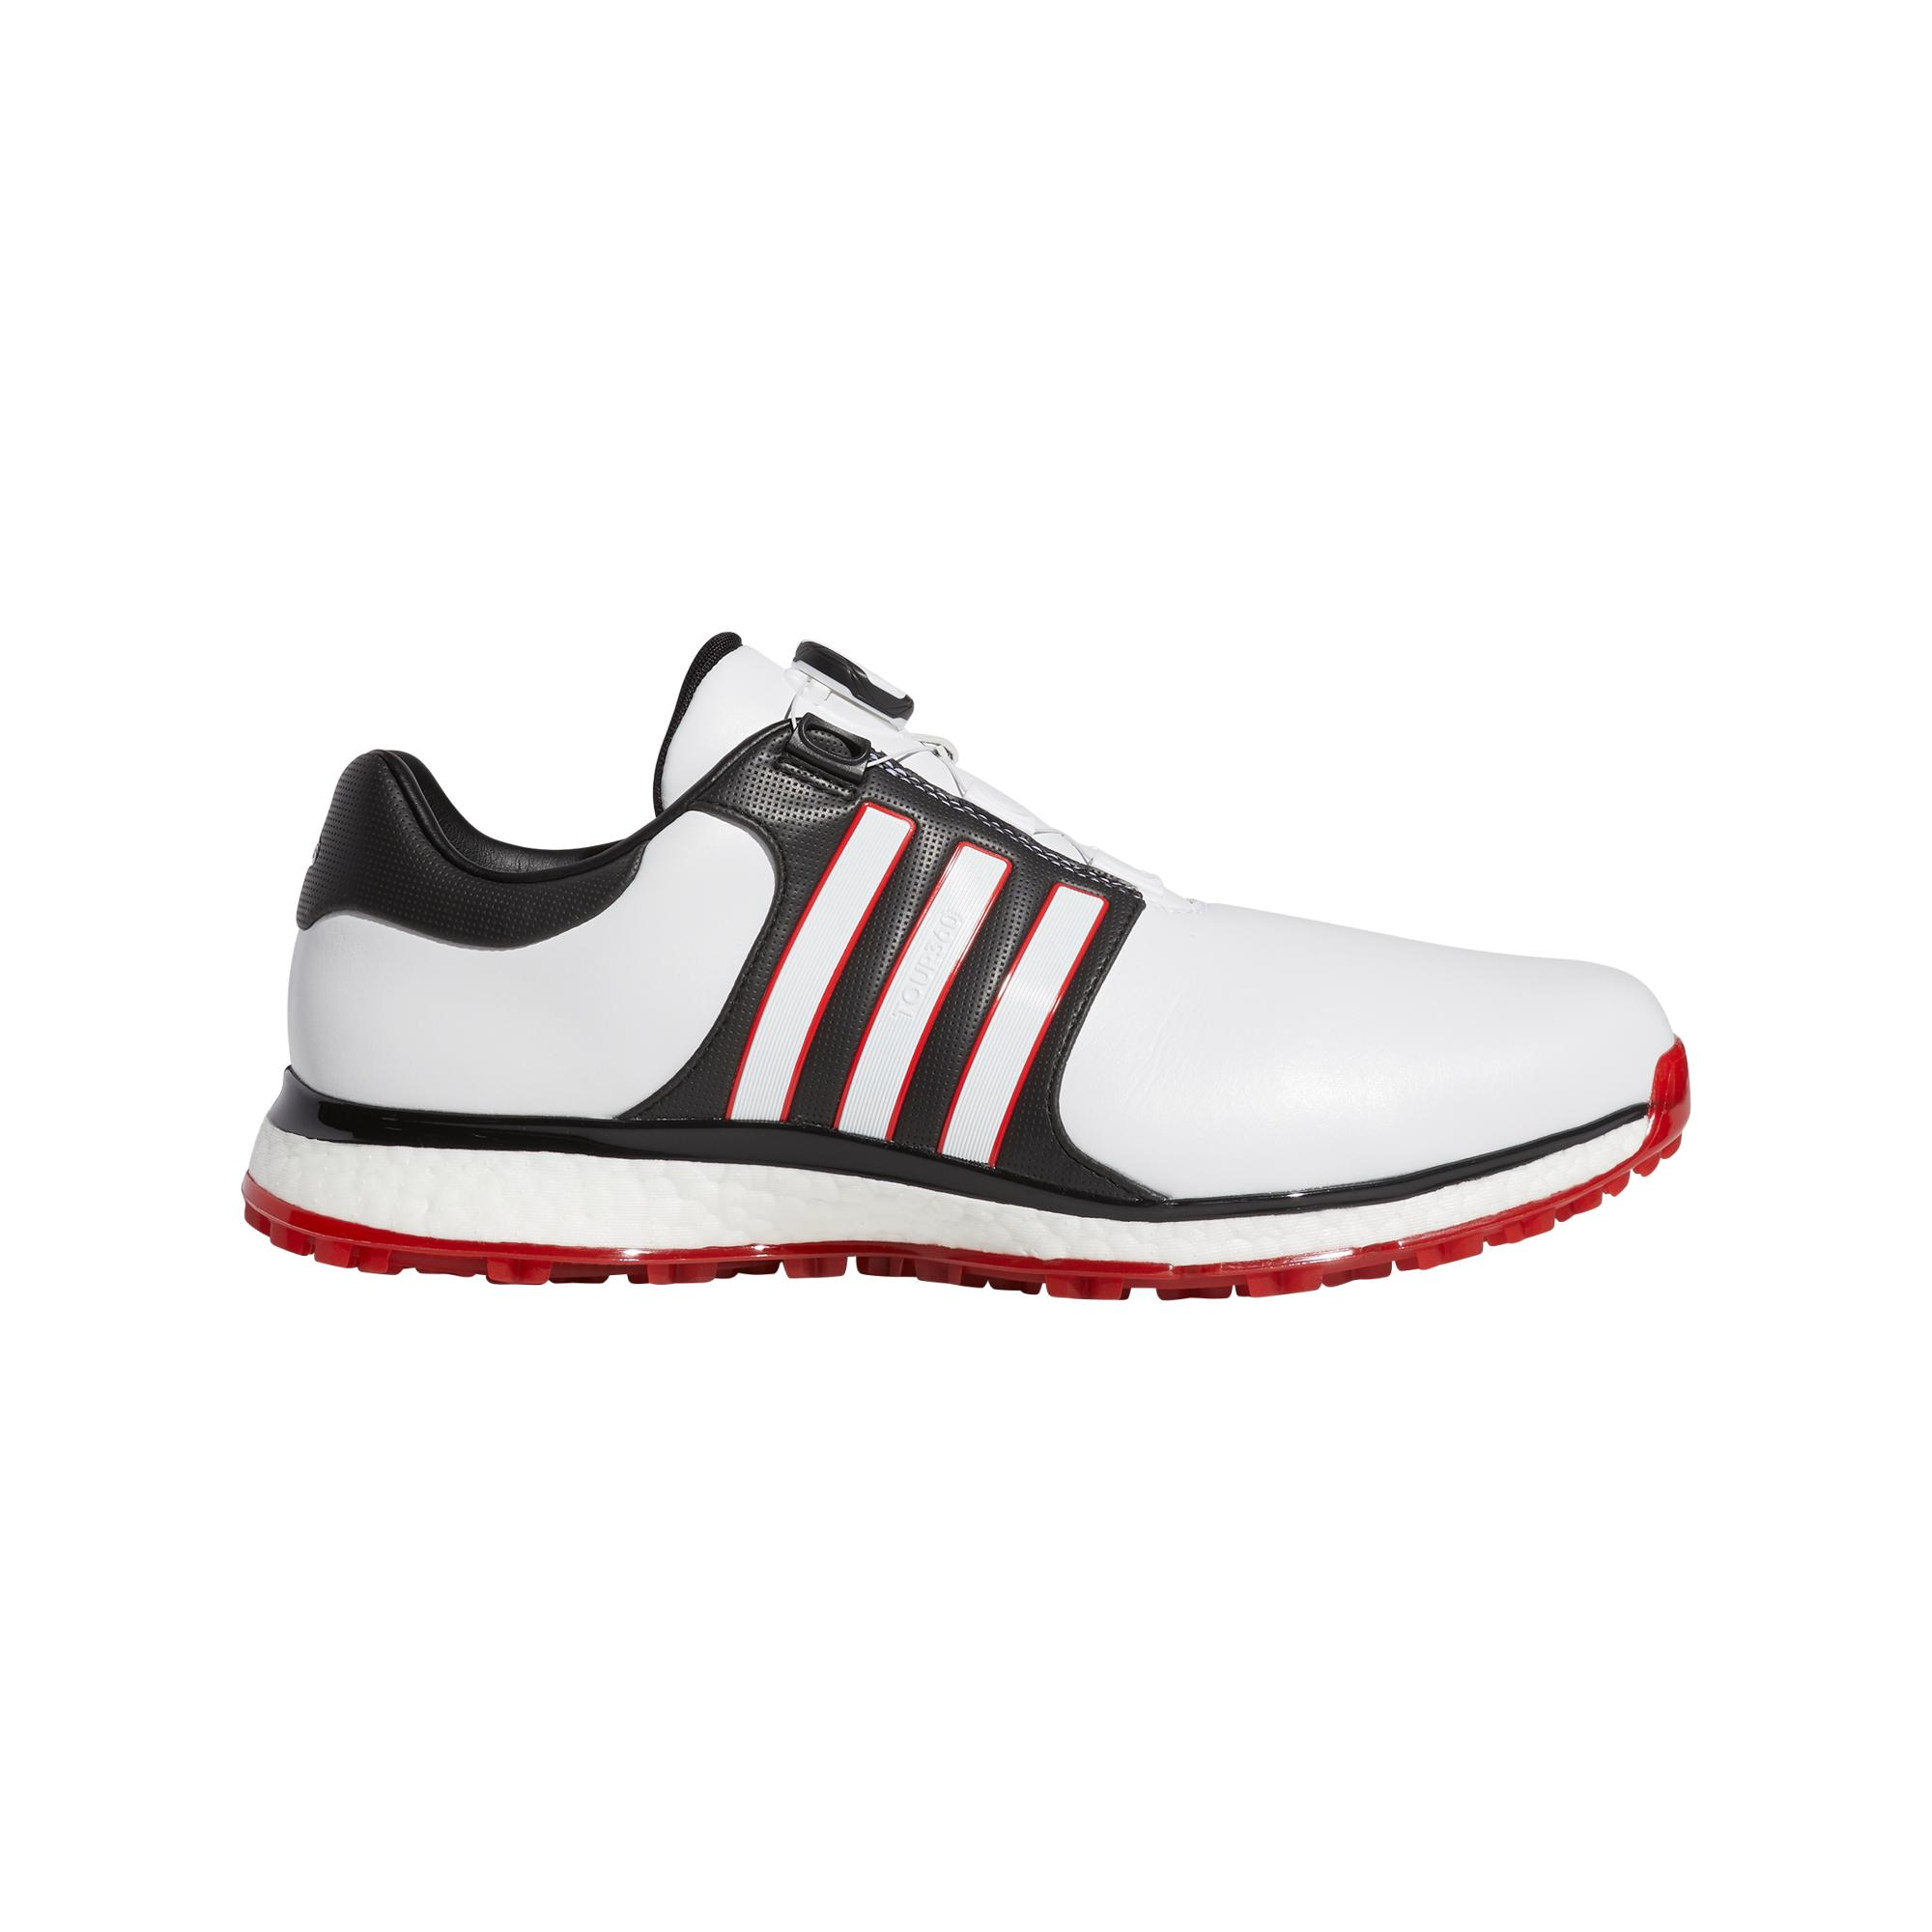 Men's Tour360 XT Boa Spikeless Golf Shoe WHITE/BLACK/RED